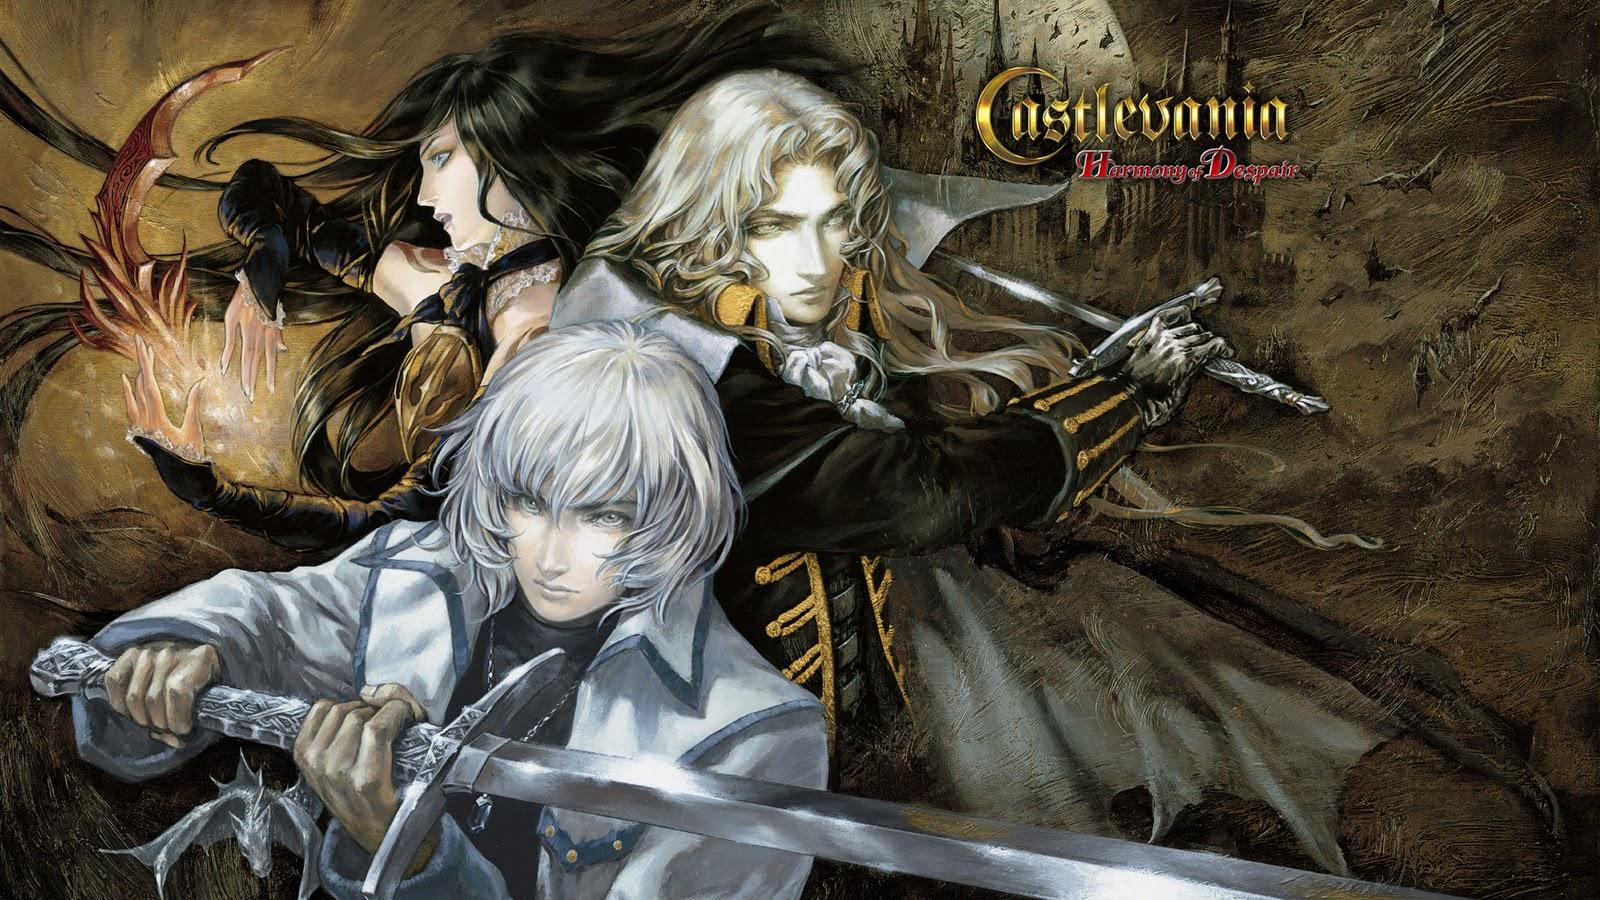 Castlevania Dawn Of Sorrow HD Wallpaper 8   1600 X 900 stmednet 1600x900